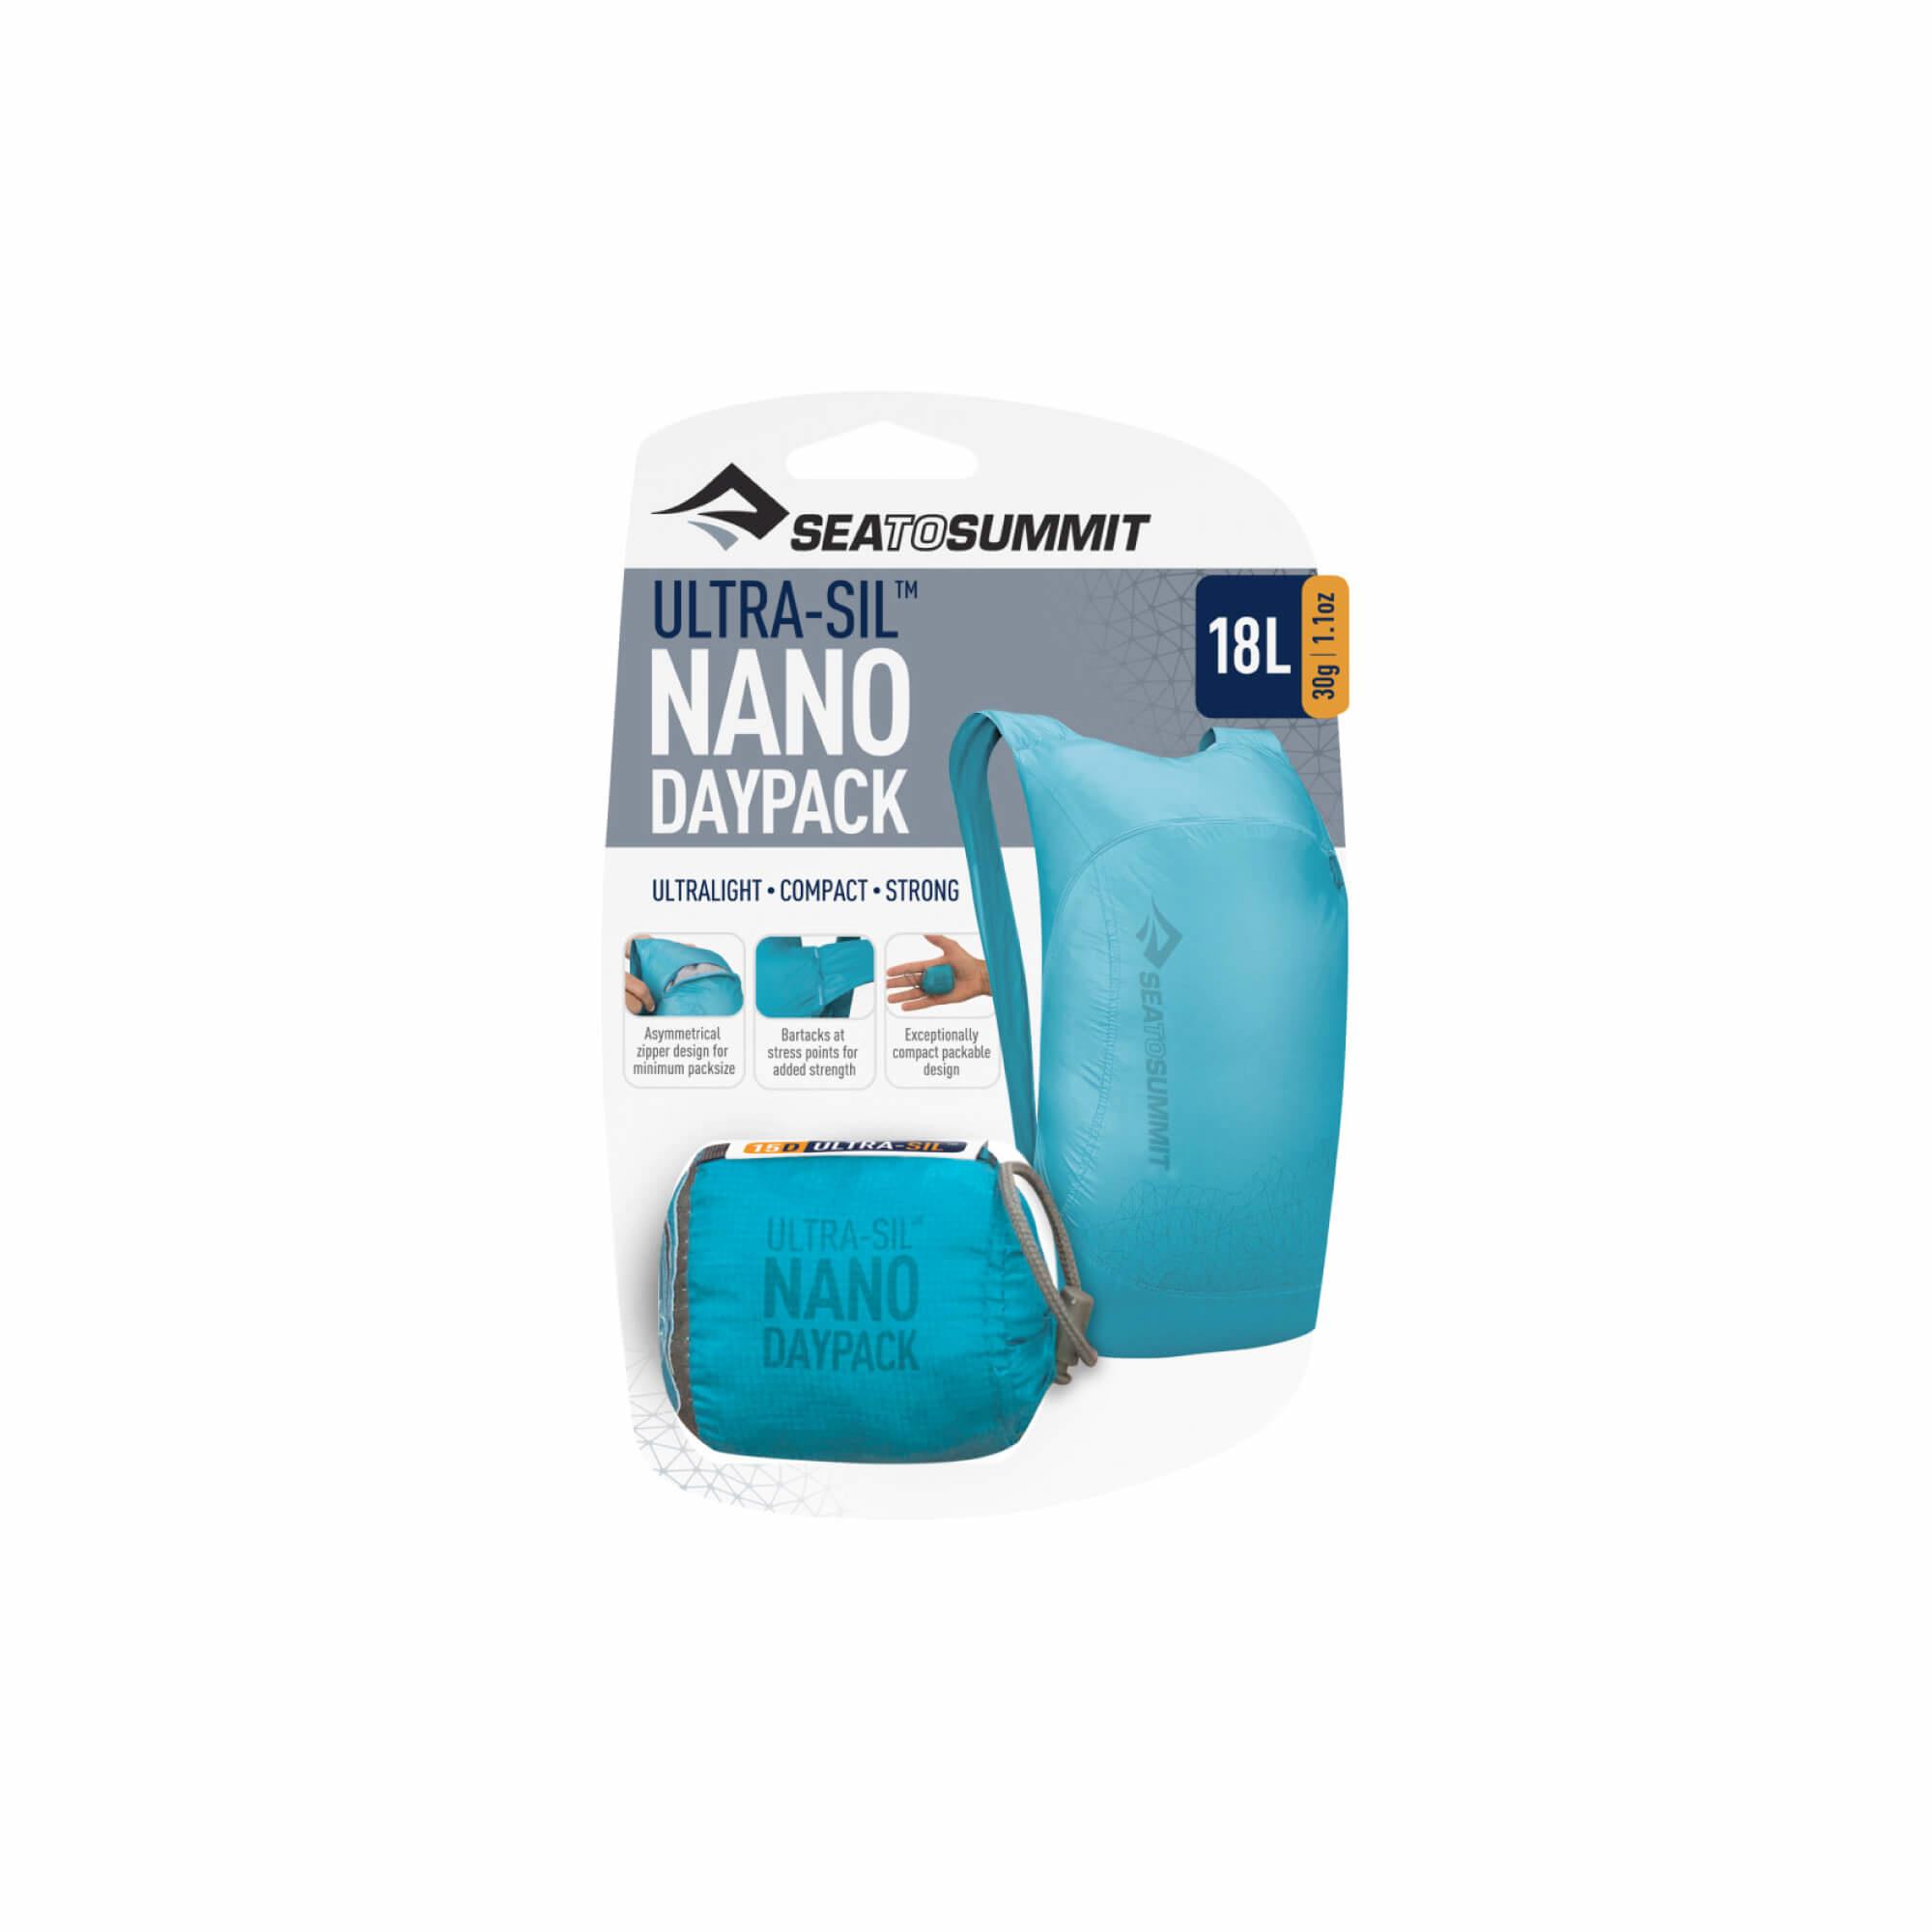 Ultra-SIL Nano Daypack-7